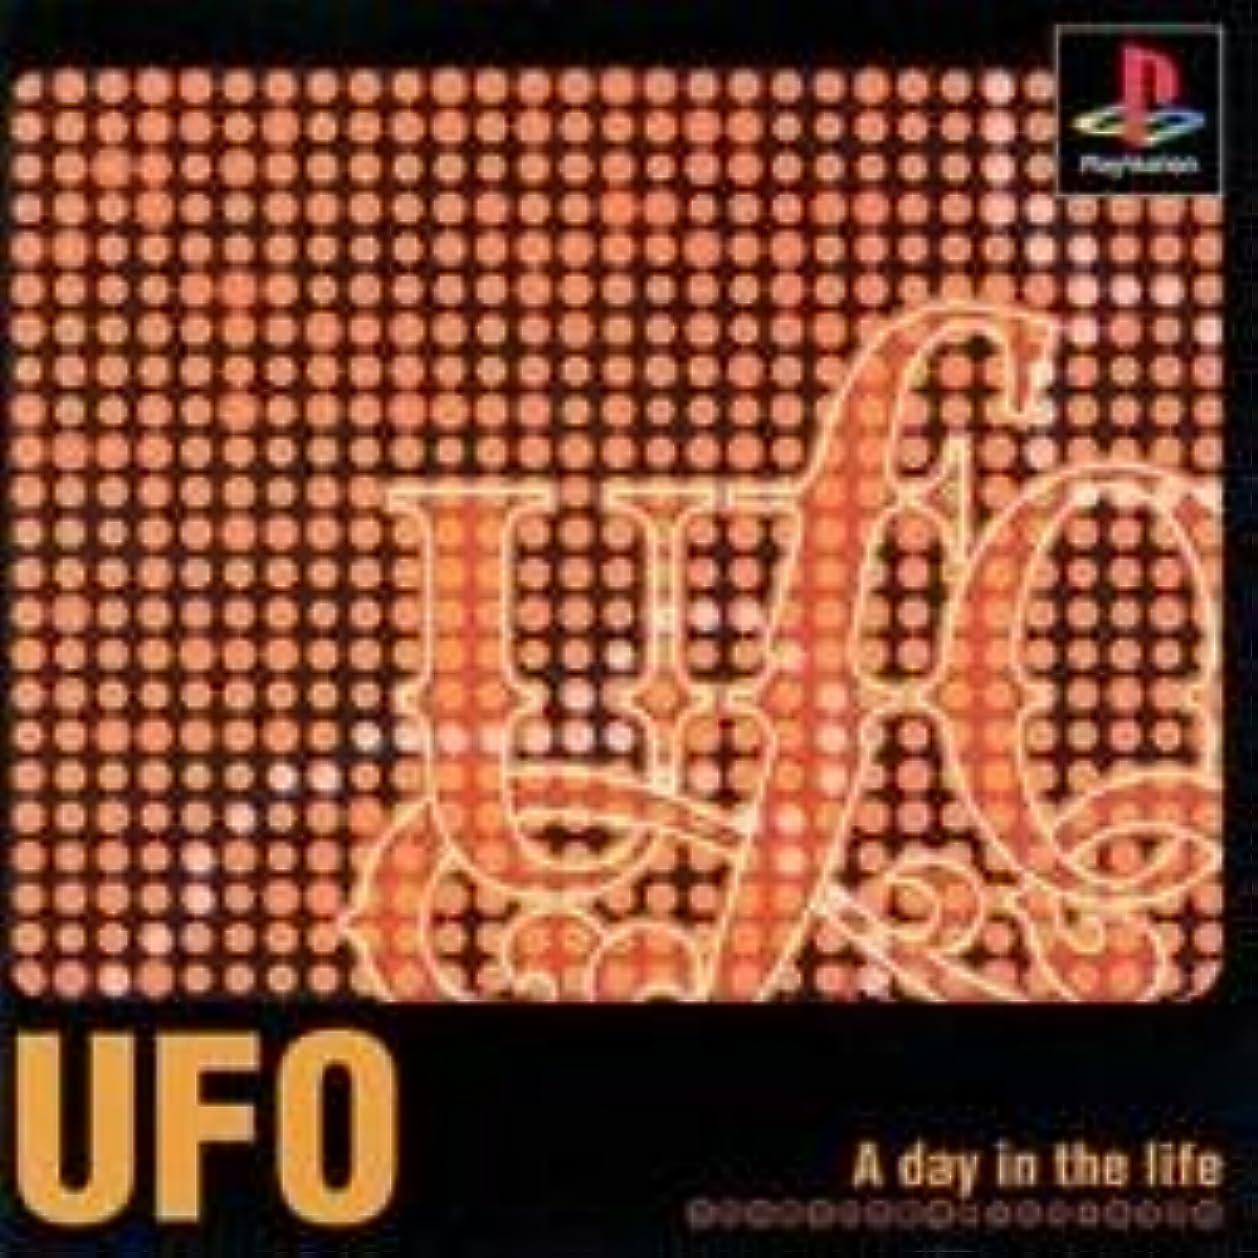 修士号科学的刃UFO A day in the life